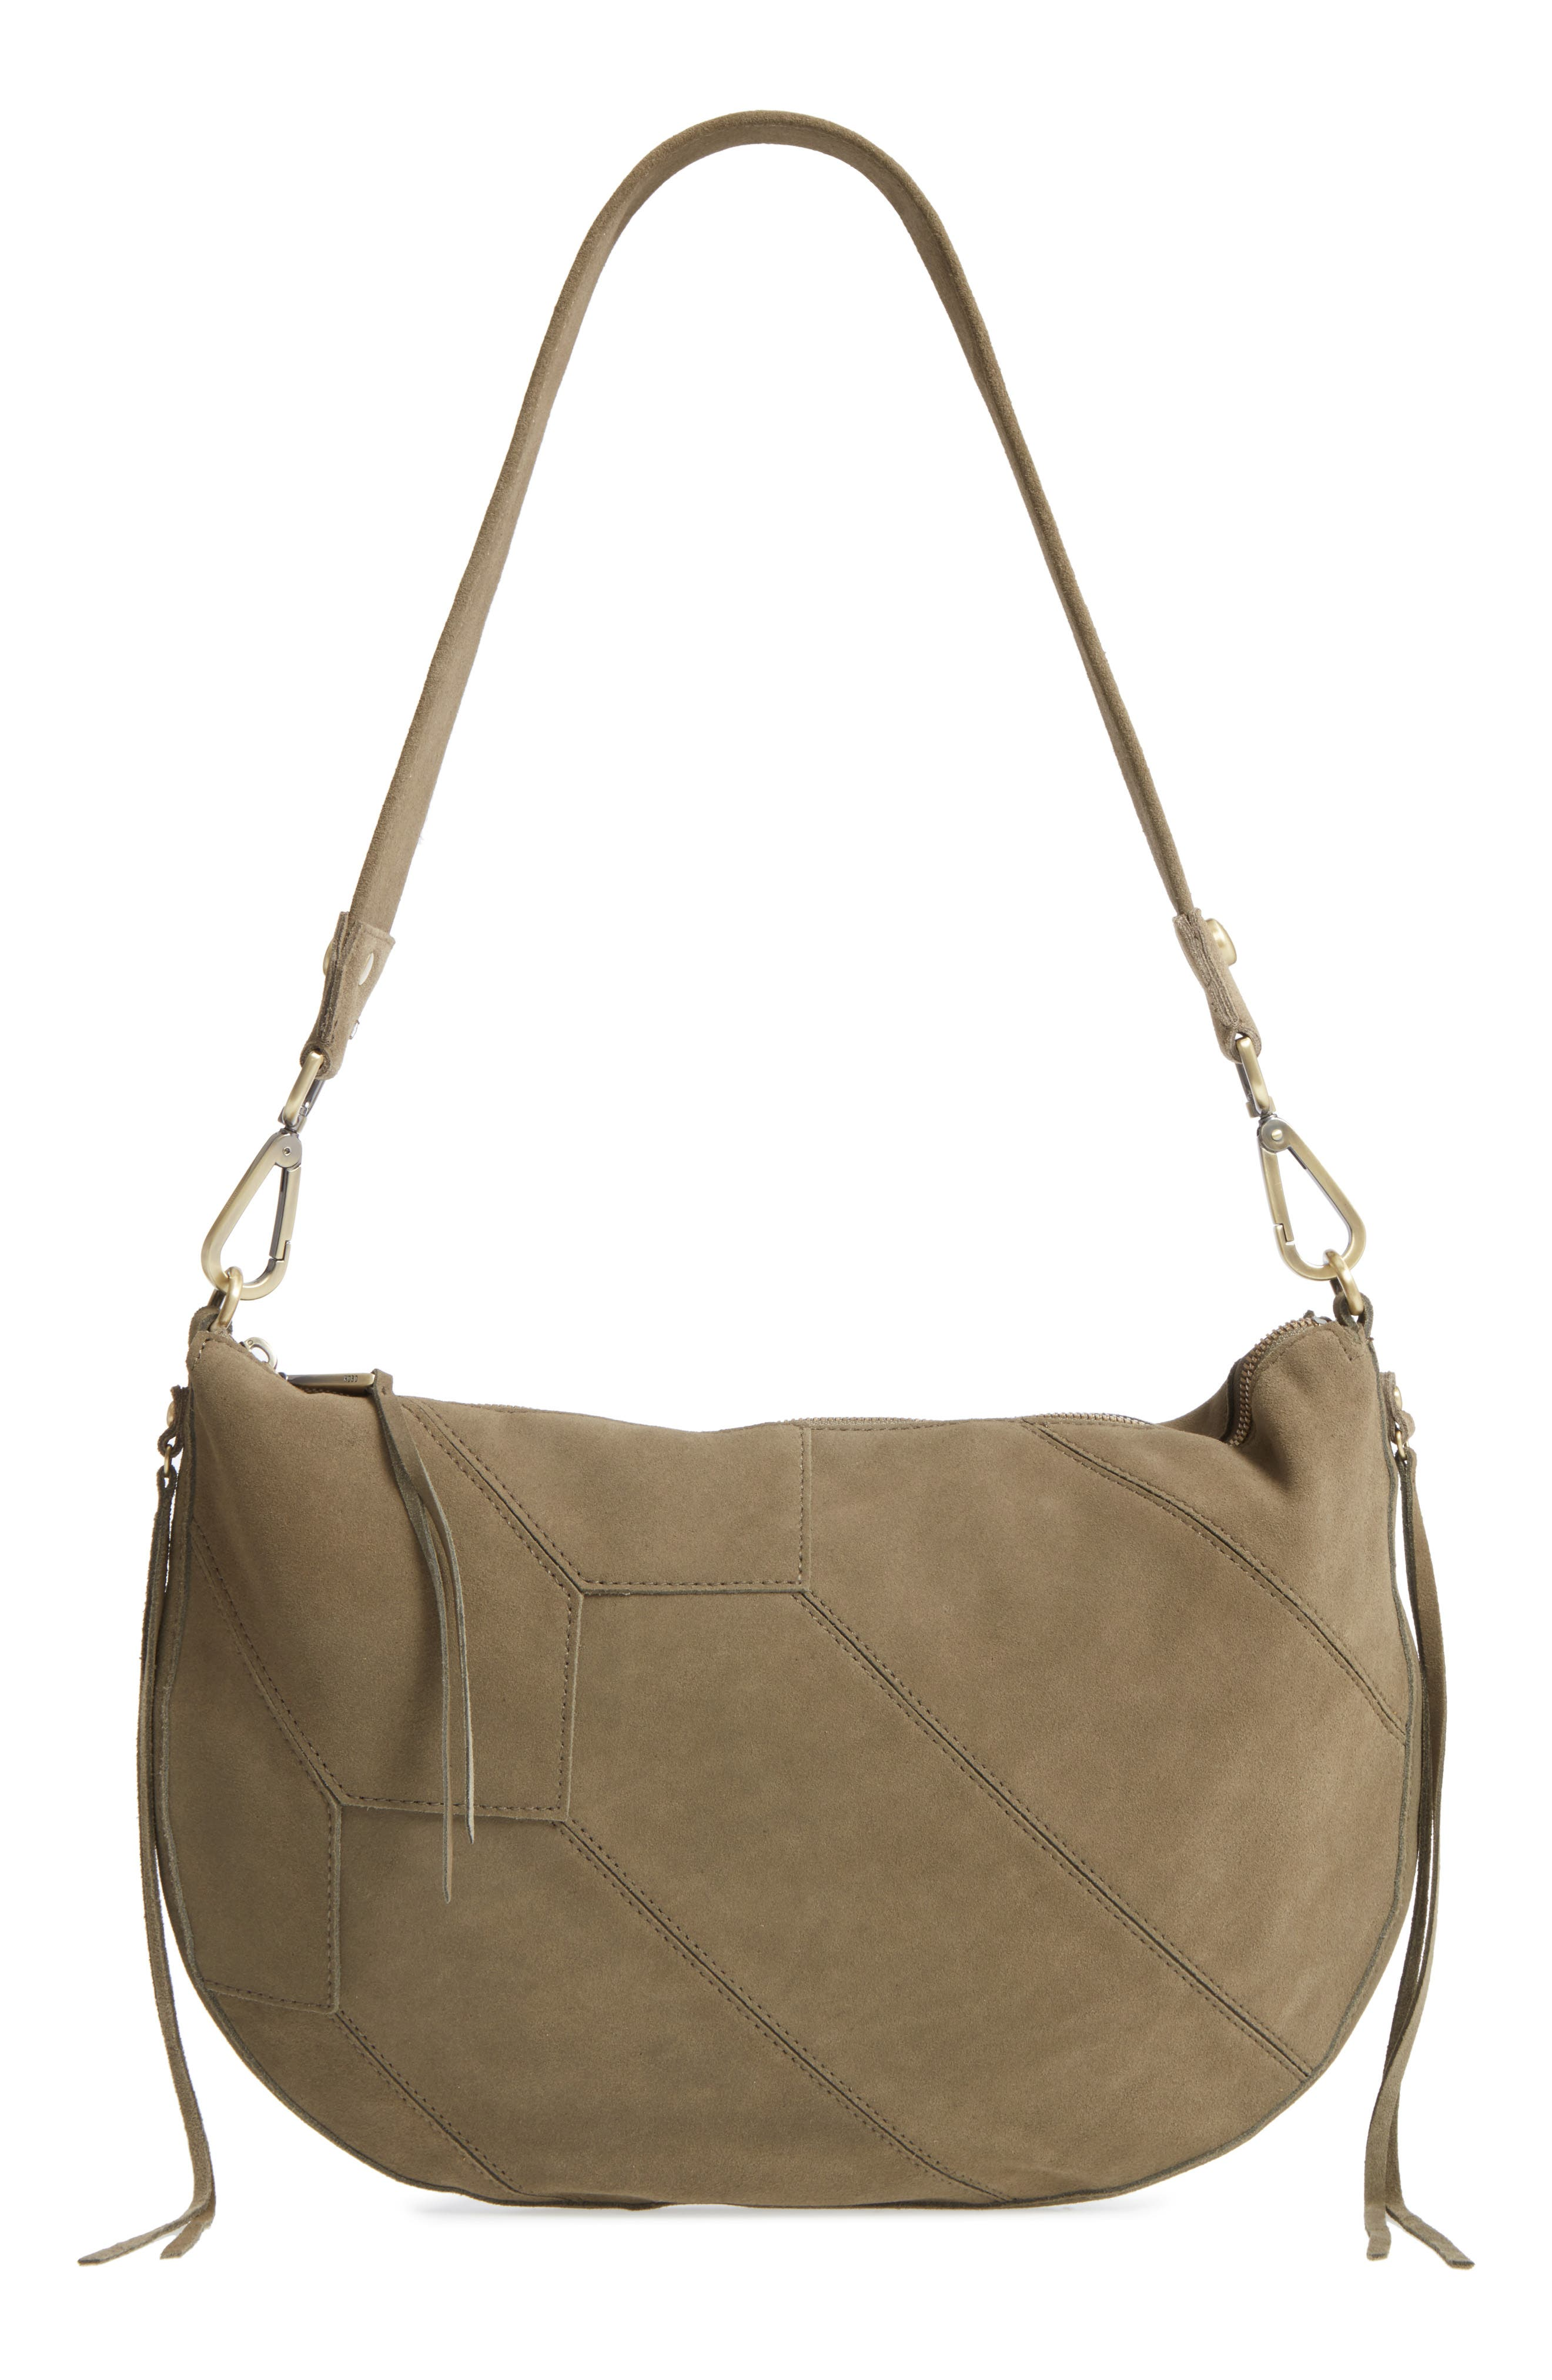 Alternate Image 1 Selected - Hobo Cisco Leather Hobo Bag